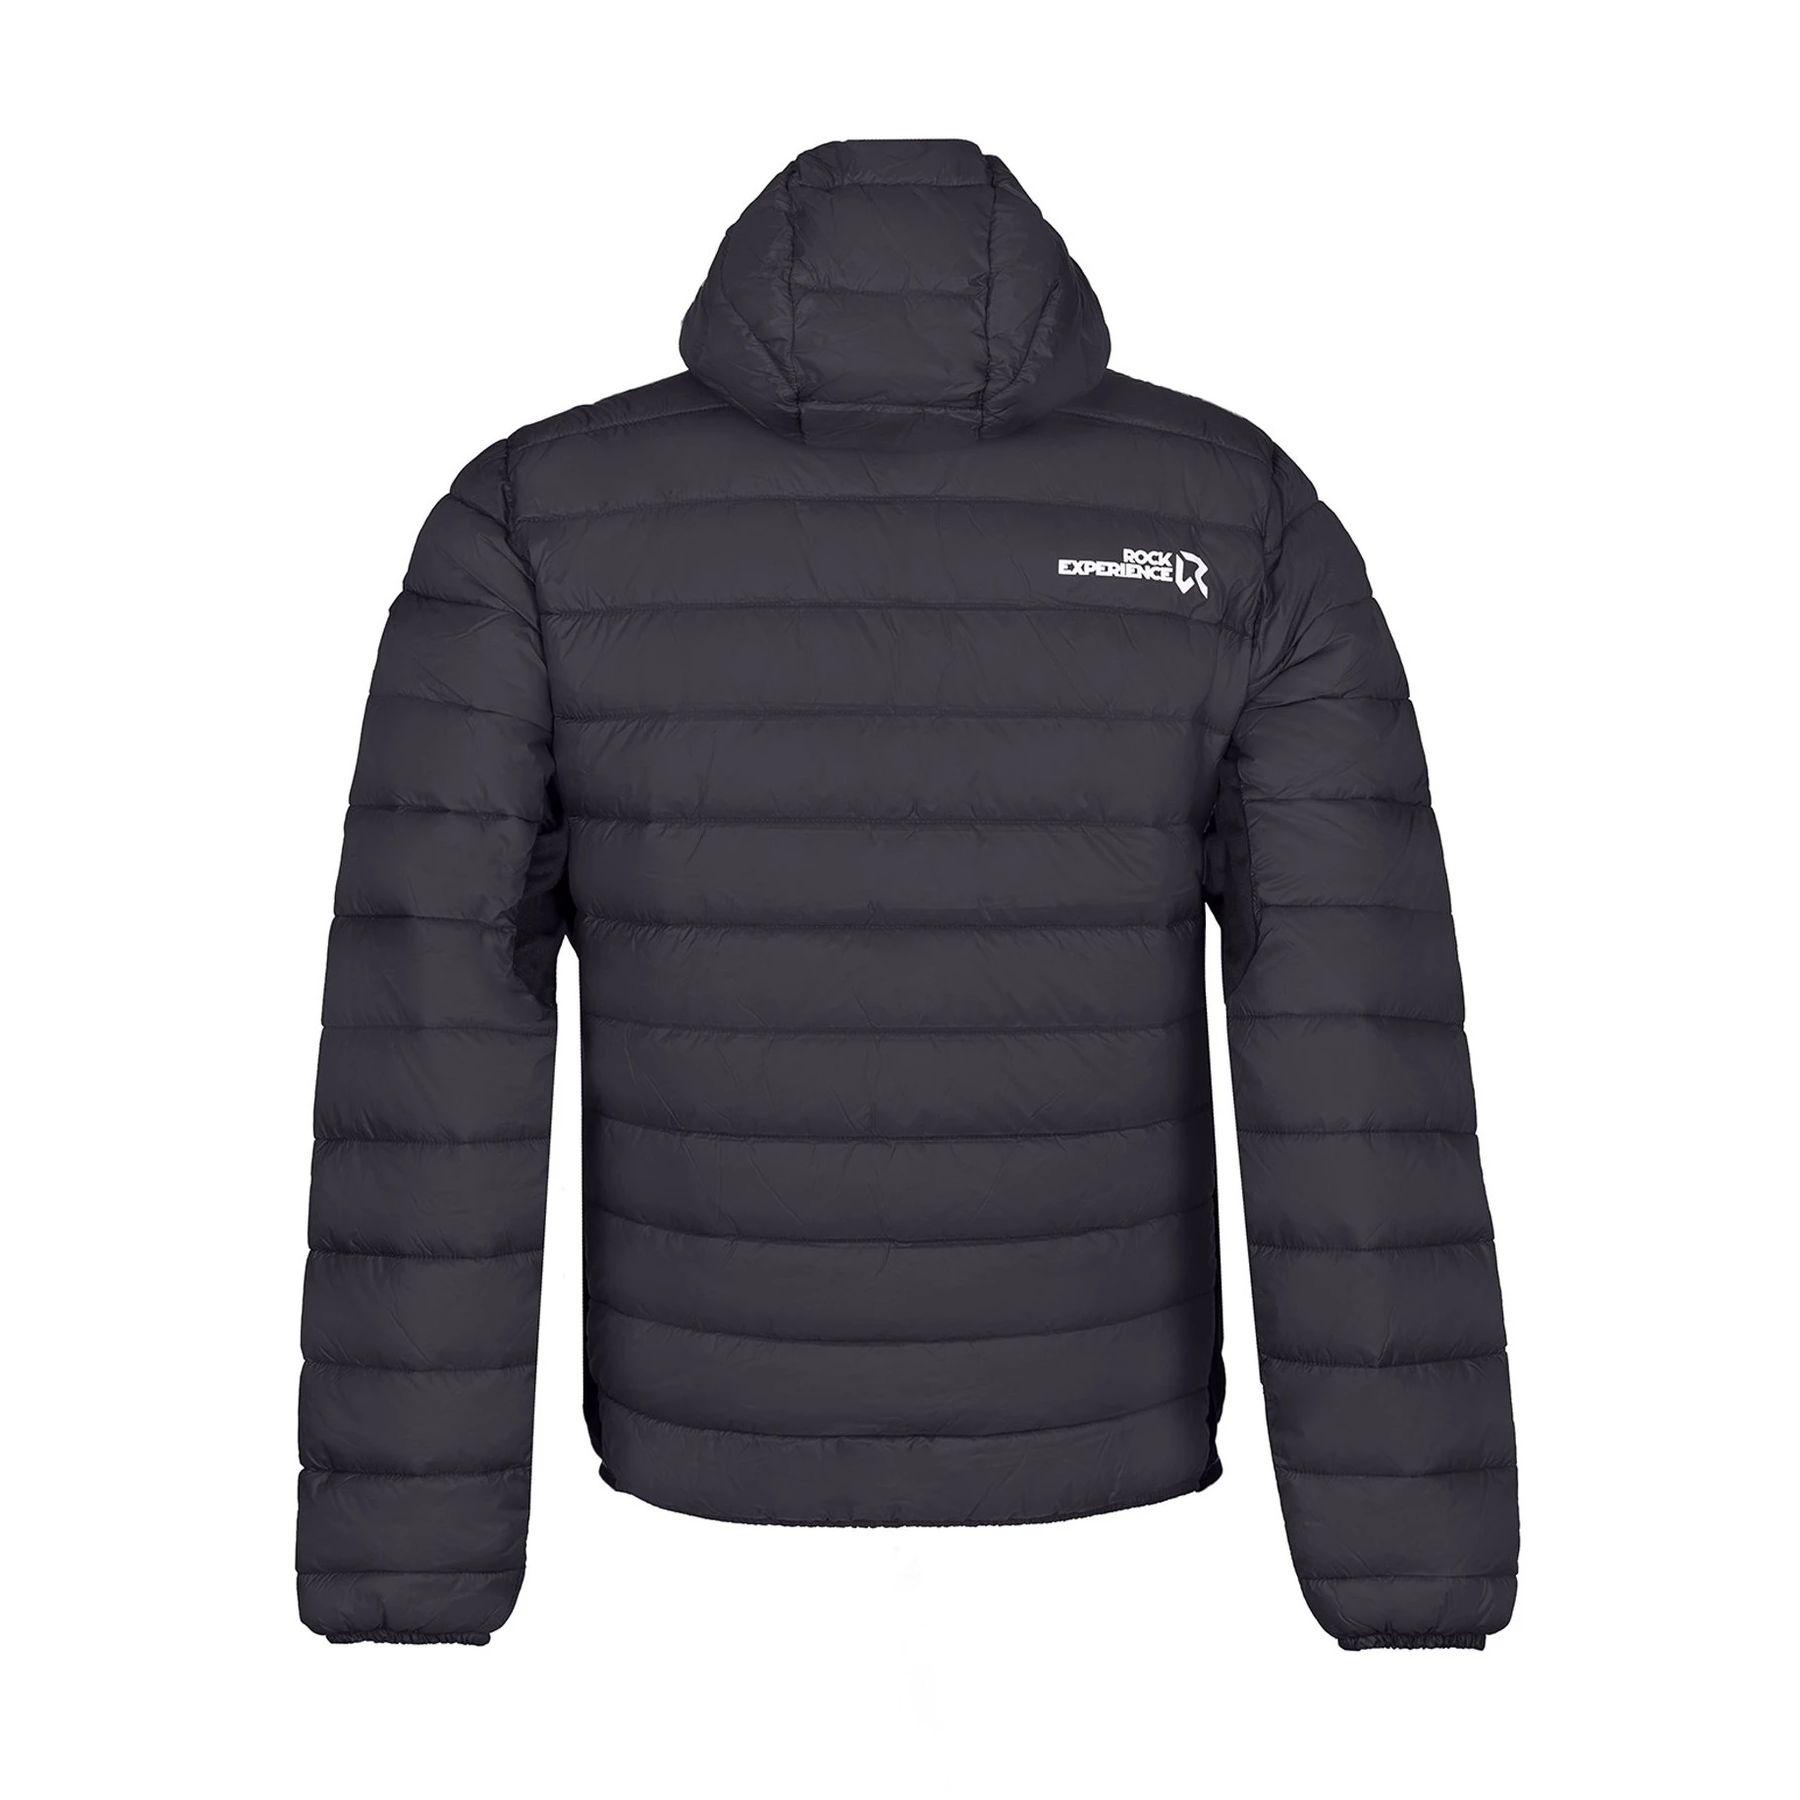 Îmbrăcăminte -  rock experience Fortune Hybrid Down Jacket